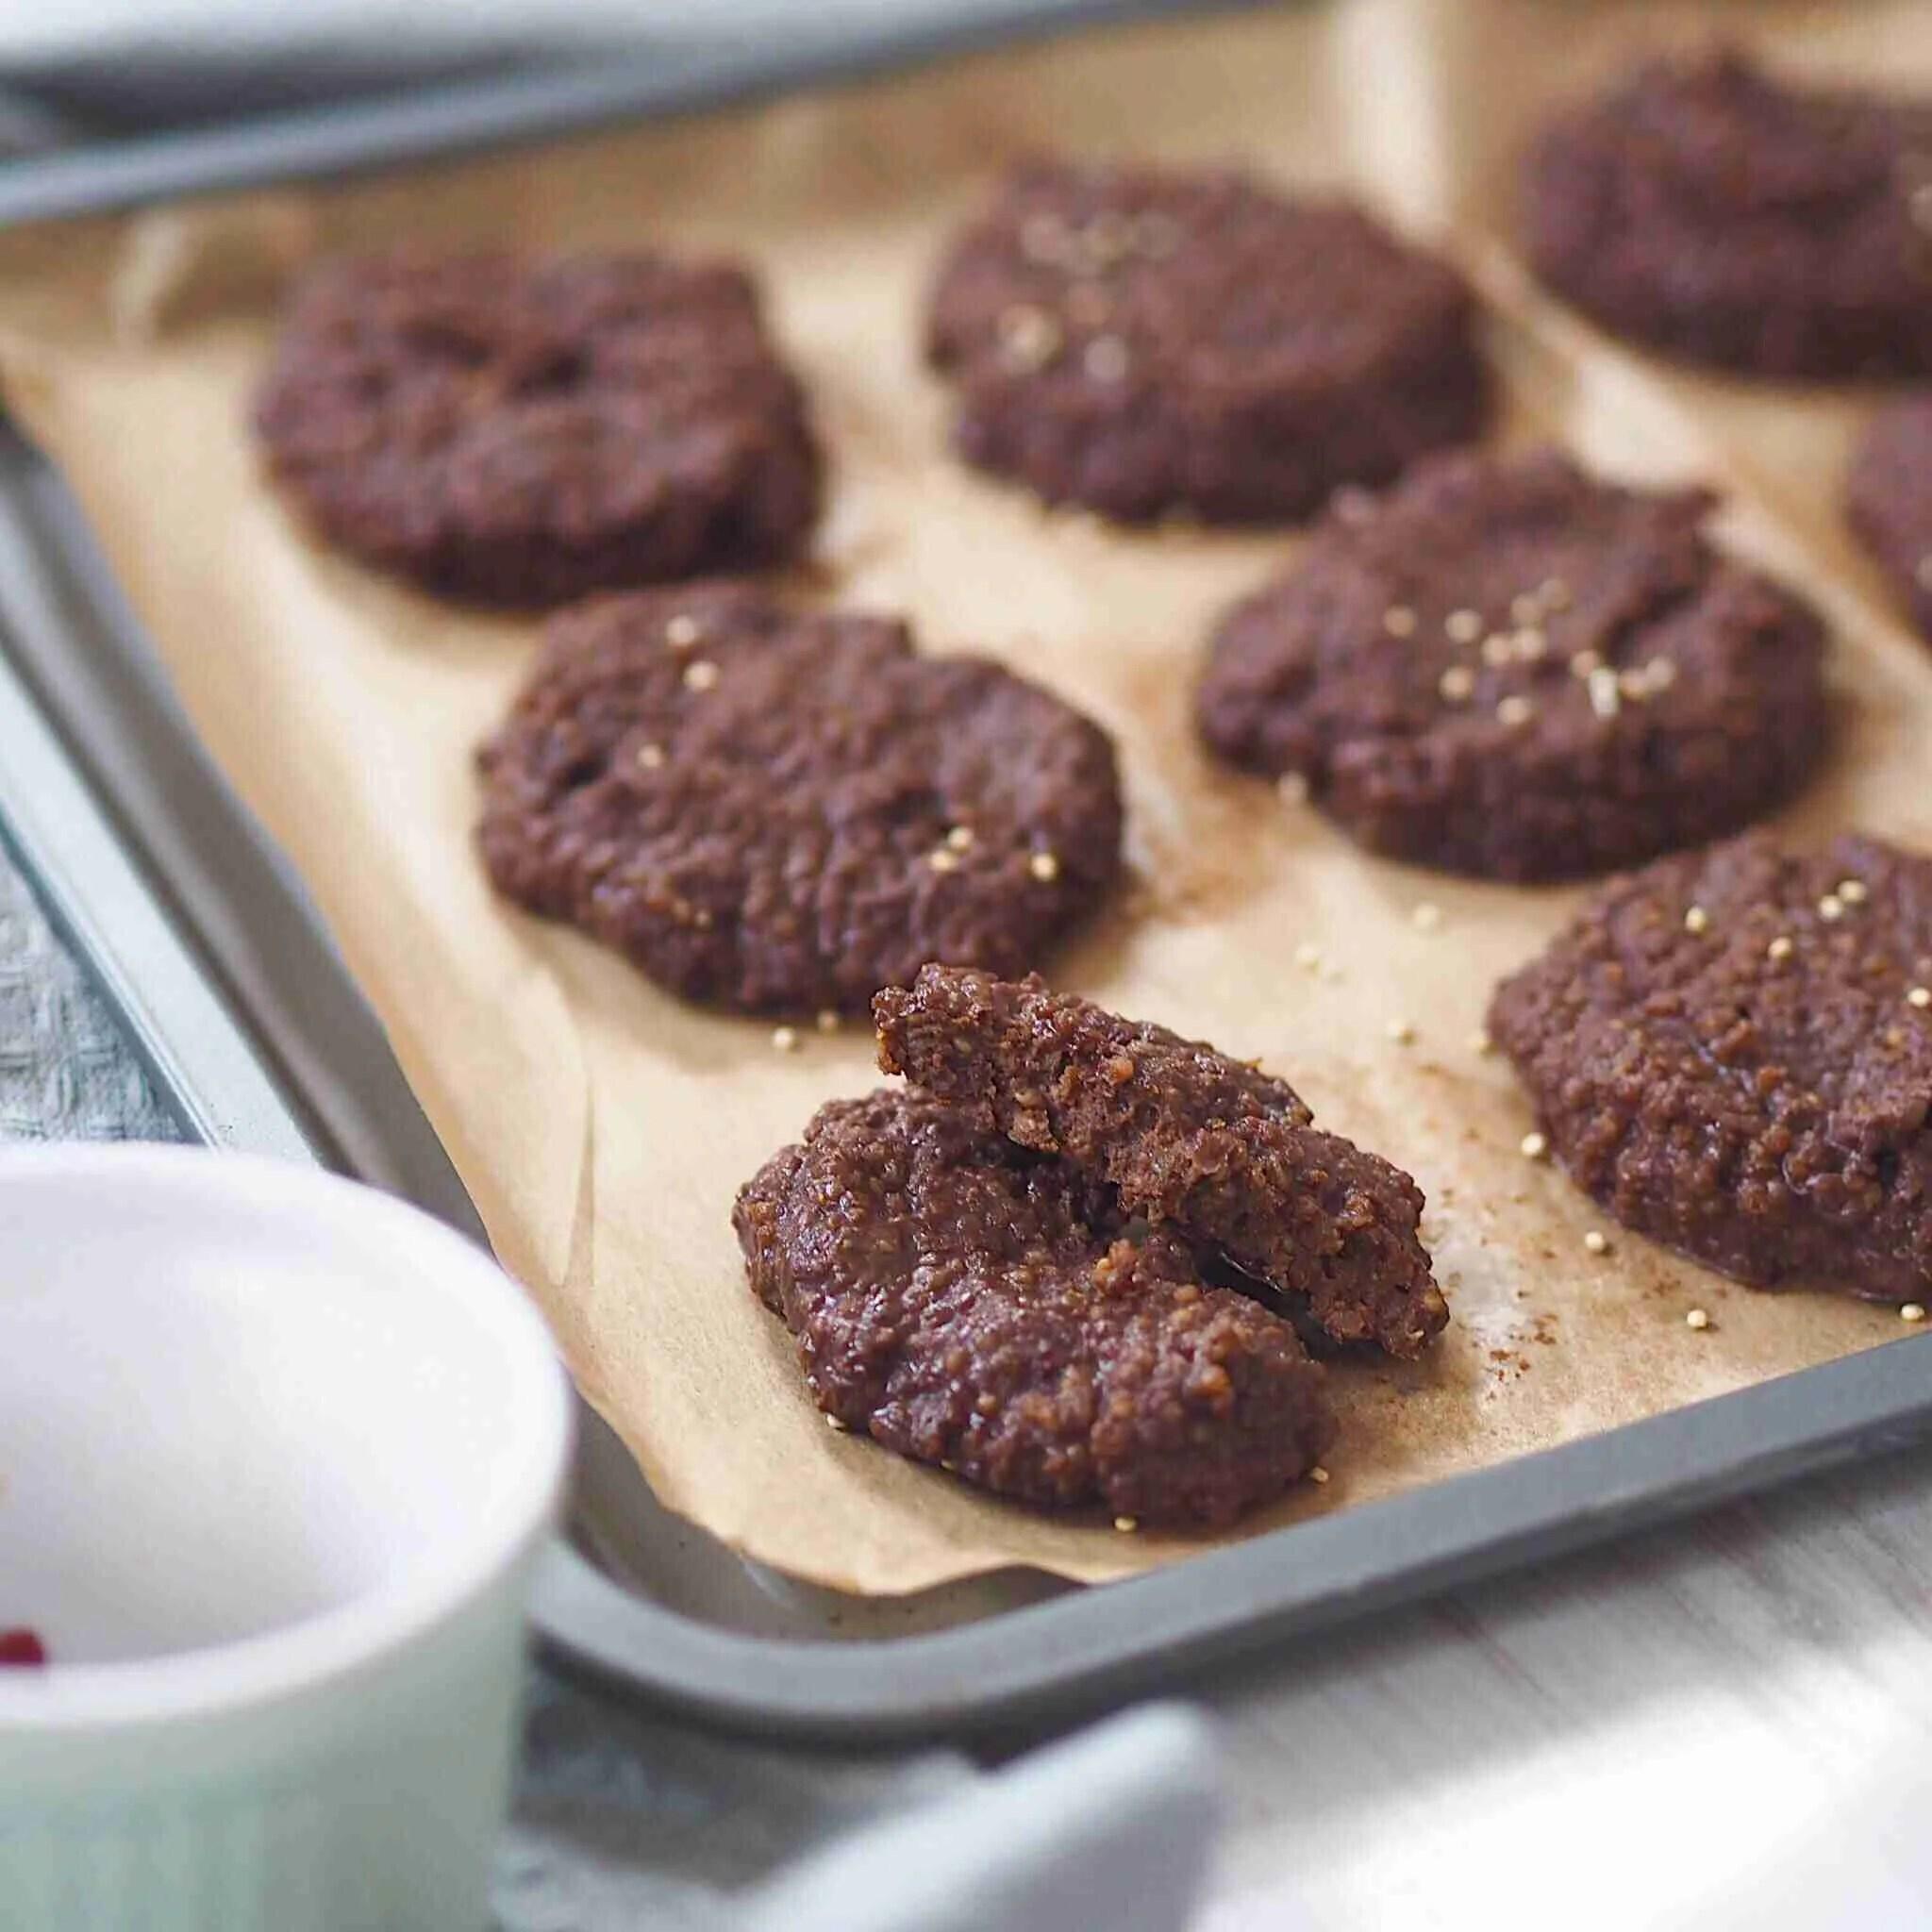 No Bake Quinoa Chocolate Peanut Butter Cookies - Vegan + Gluten Free